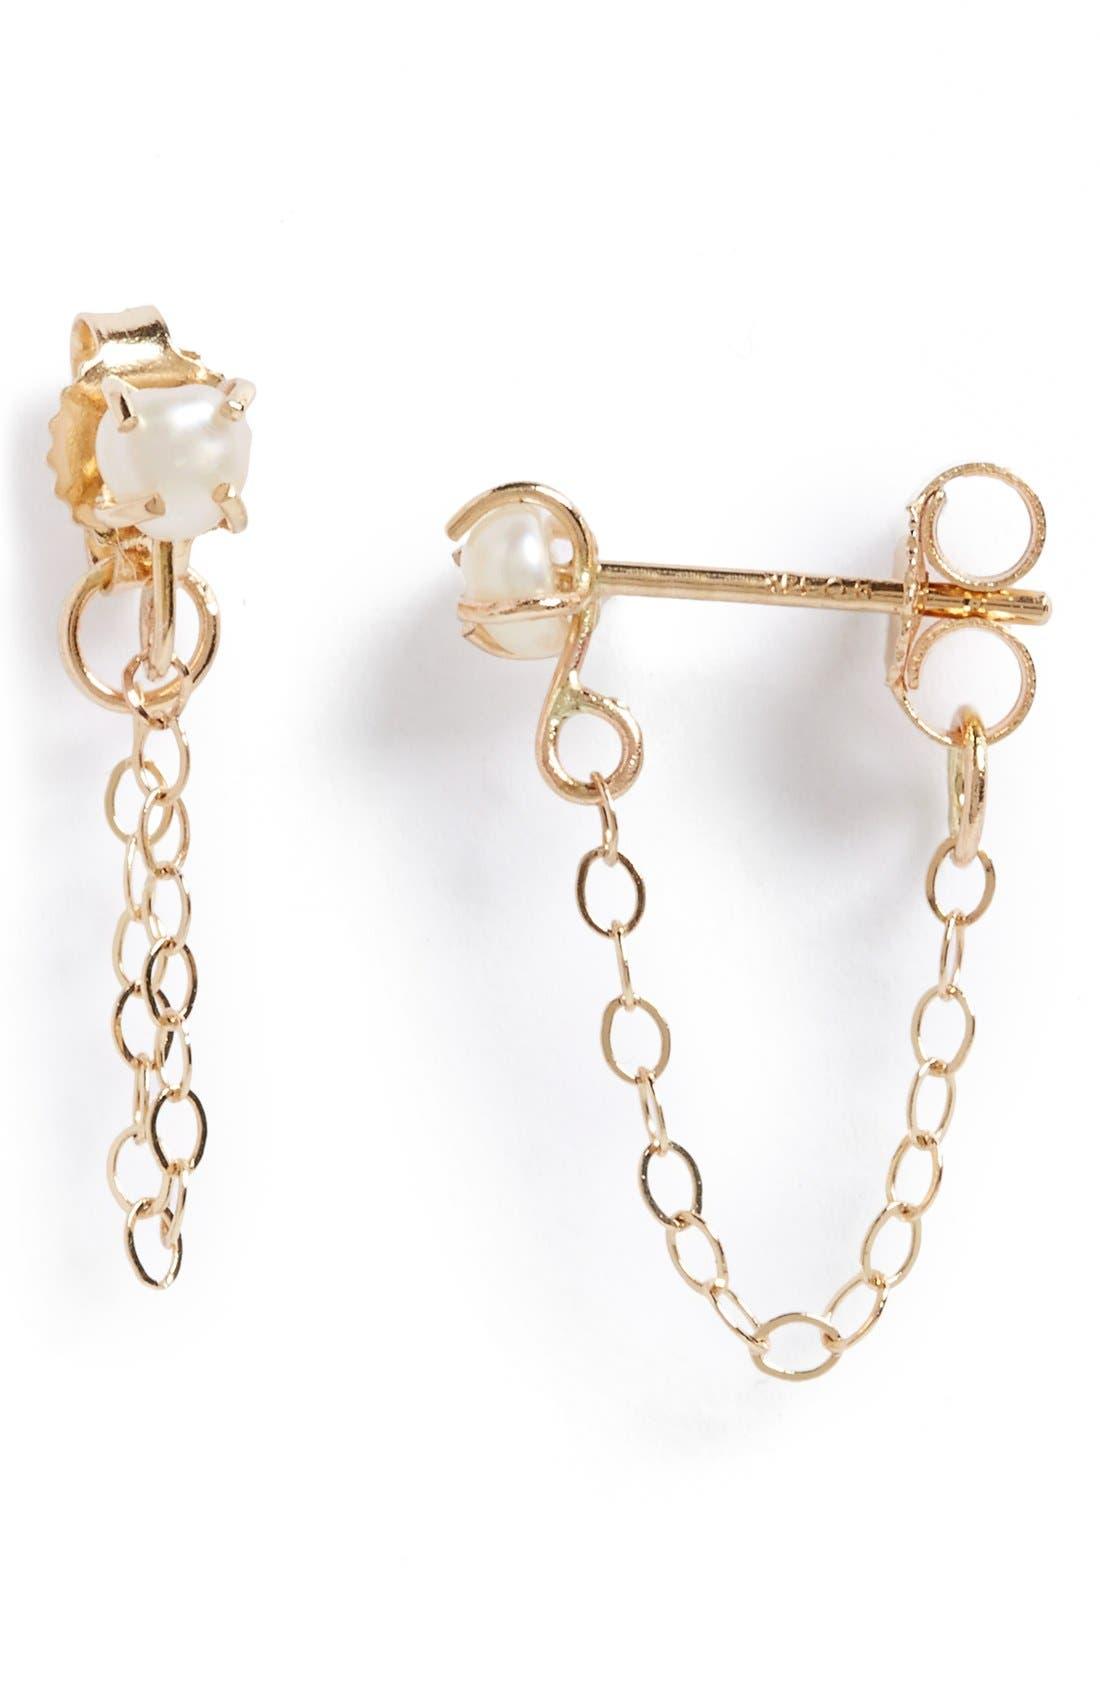 Melissa Joy Manning Keshi Pearl Ear Chains